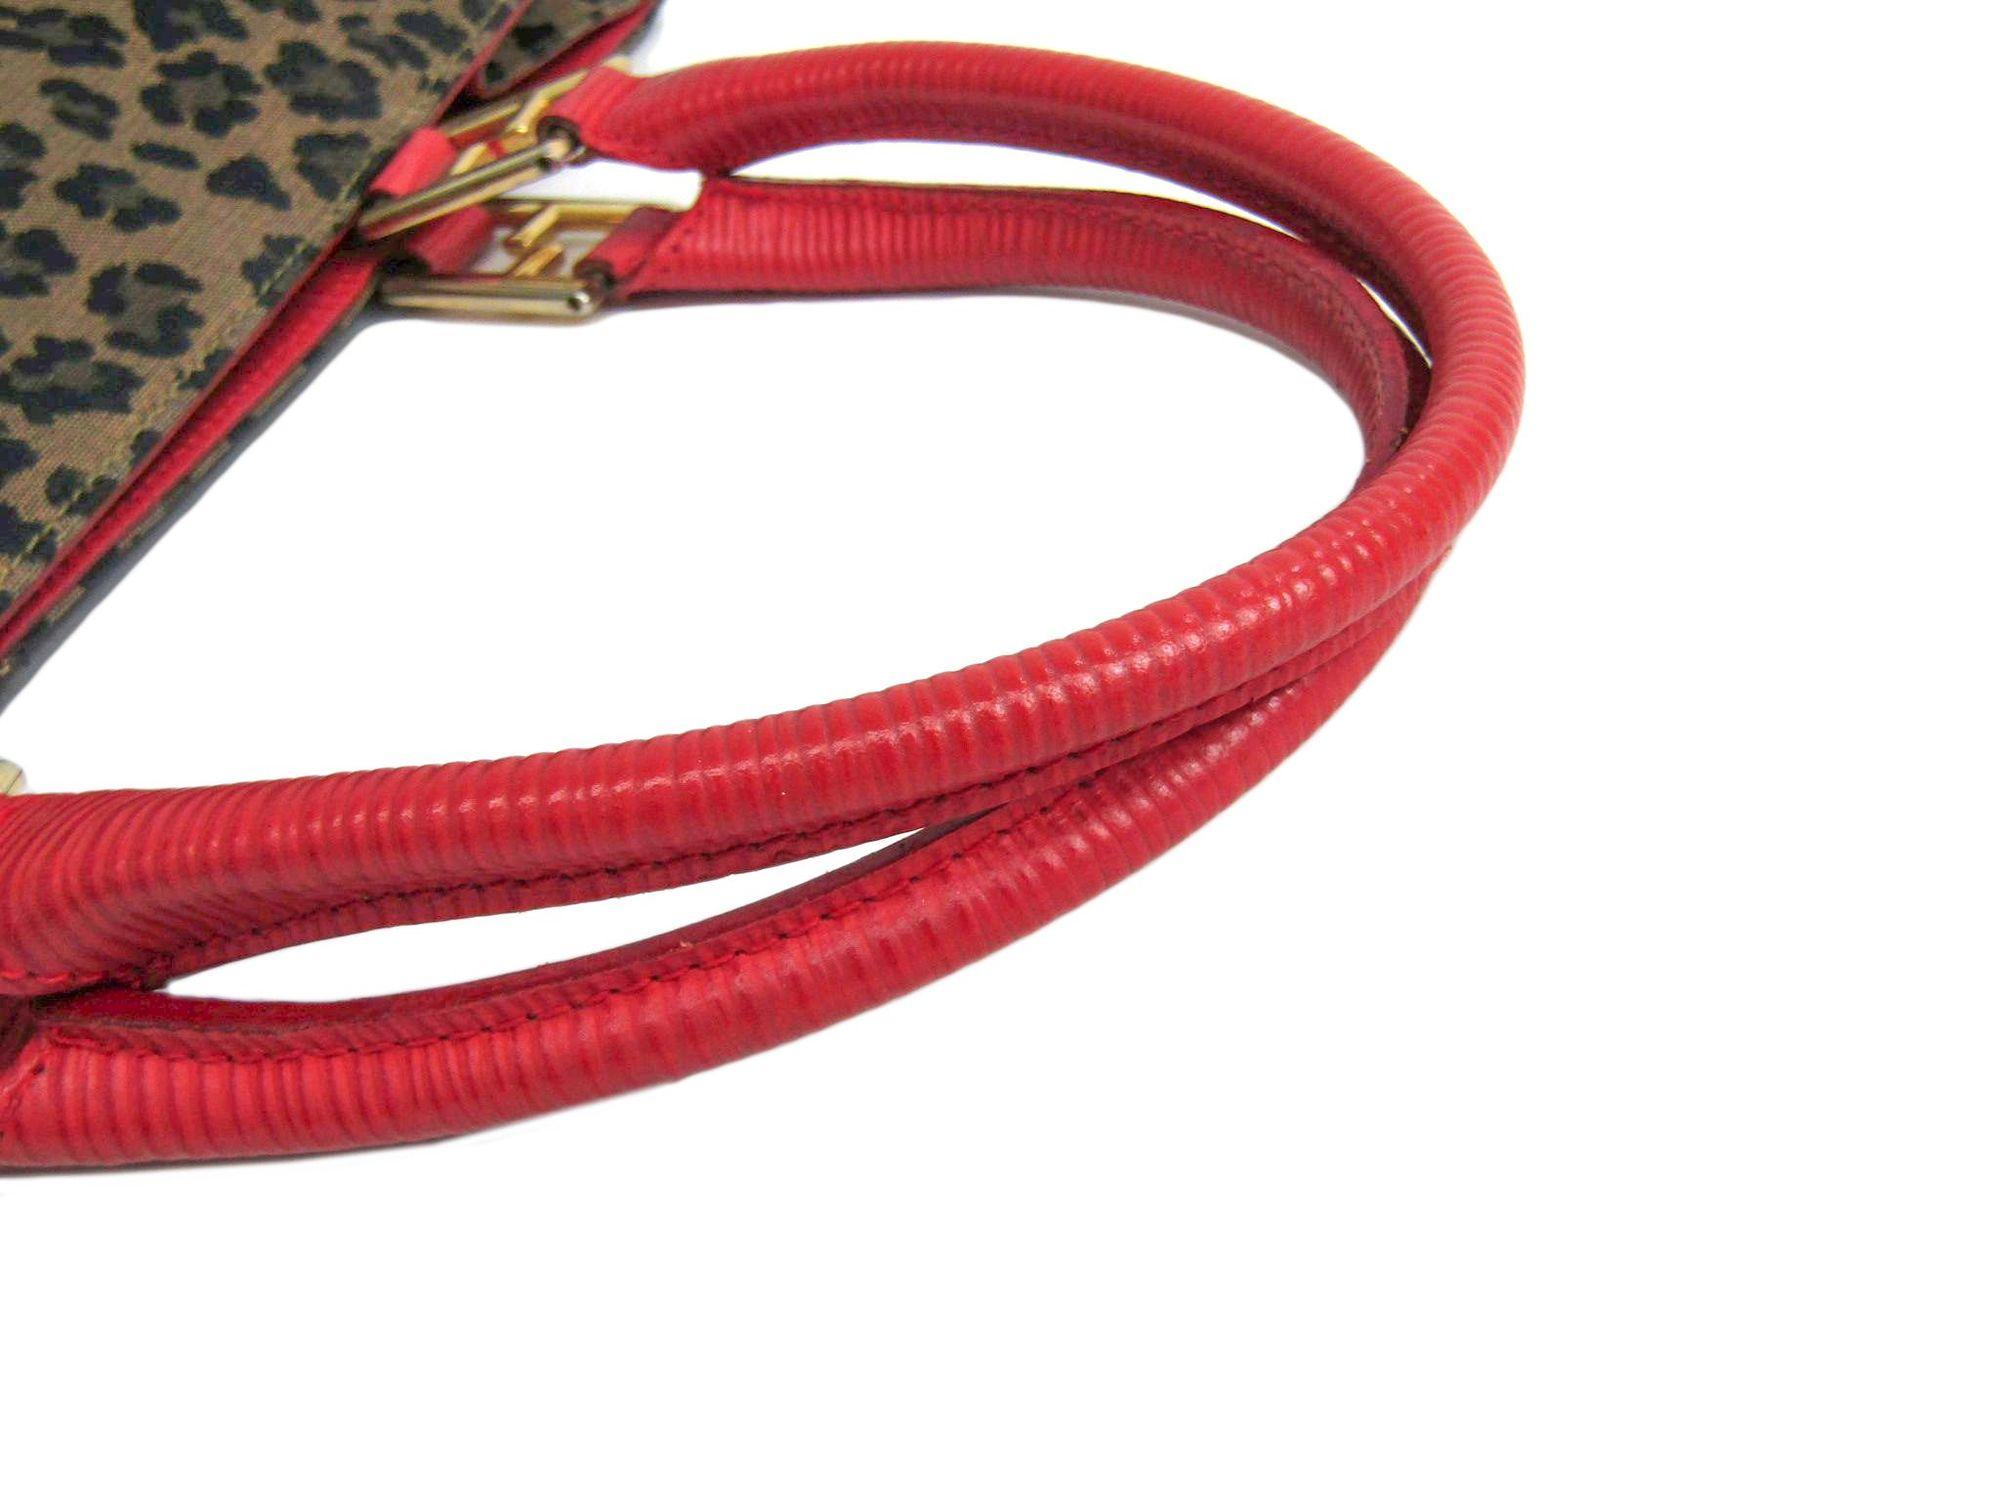 a31b663b6d Fendi Tote Bag Leopard Canvas   Leather Beige   Red 261910 BF302455 ...